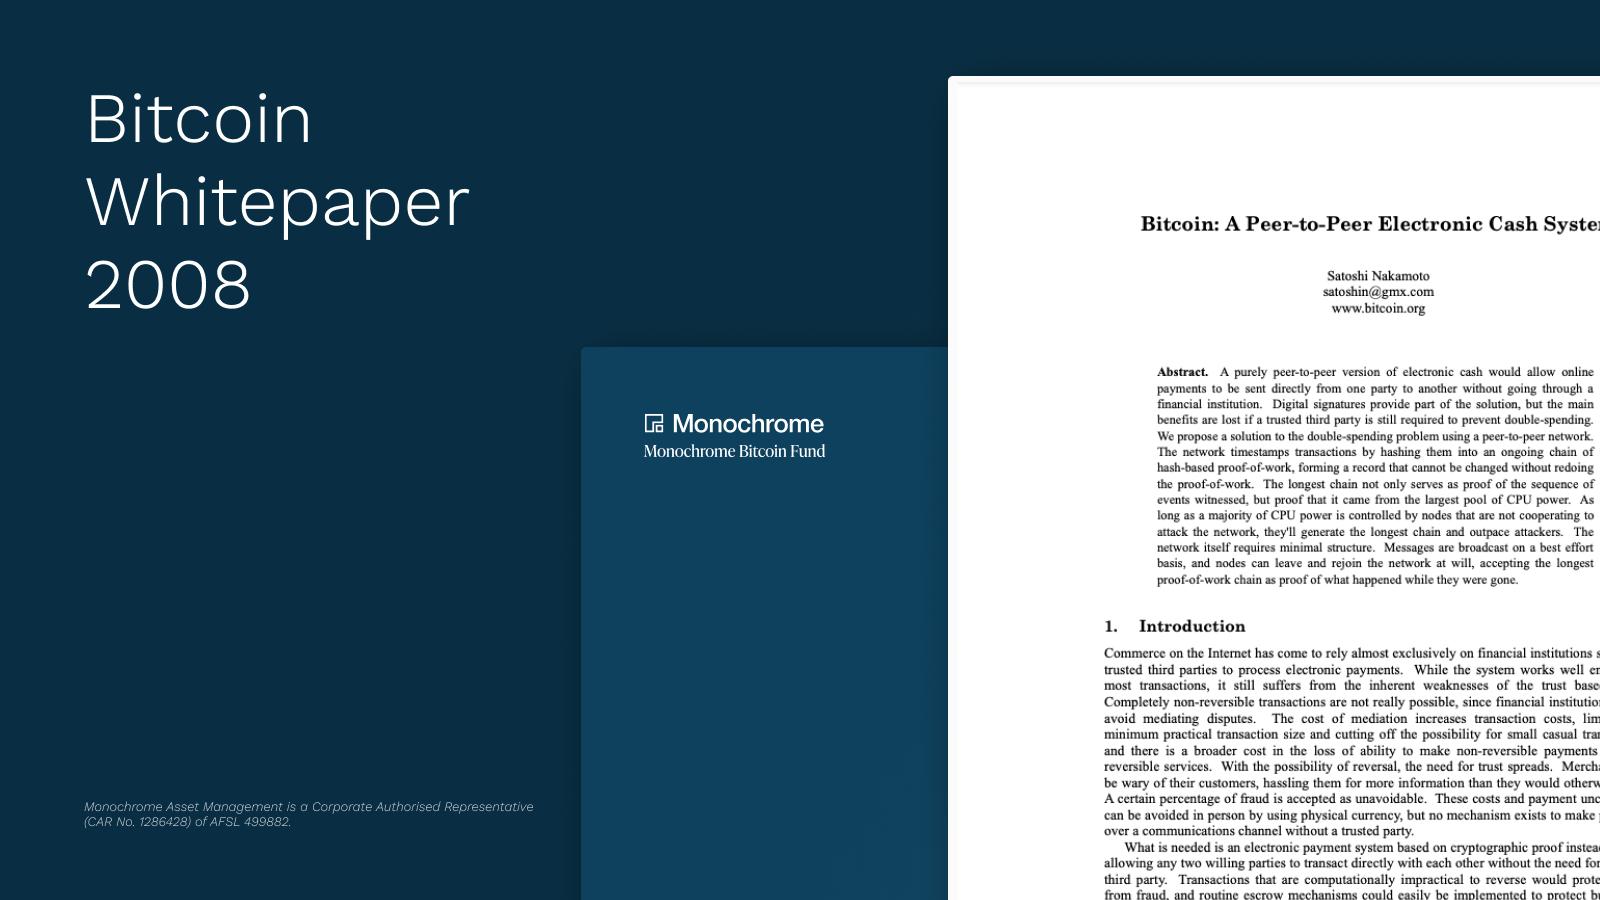 1600x900_Monochrome Asset Management_Bitcoin Whitepaper.png